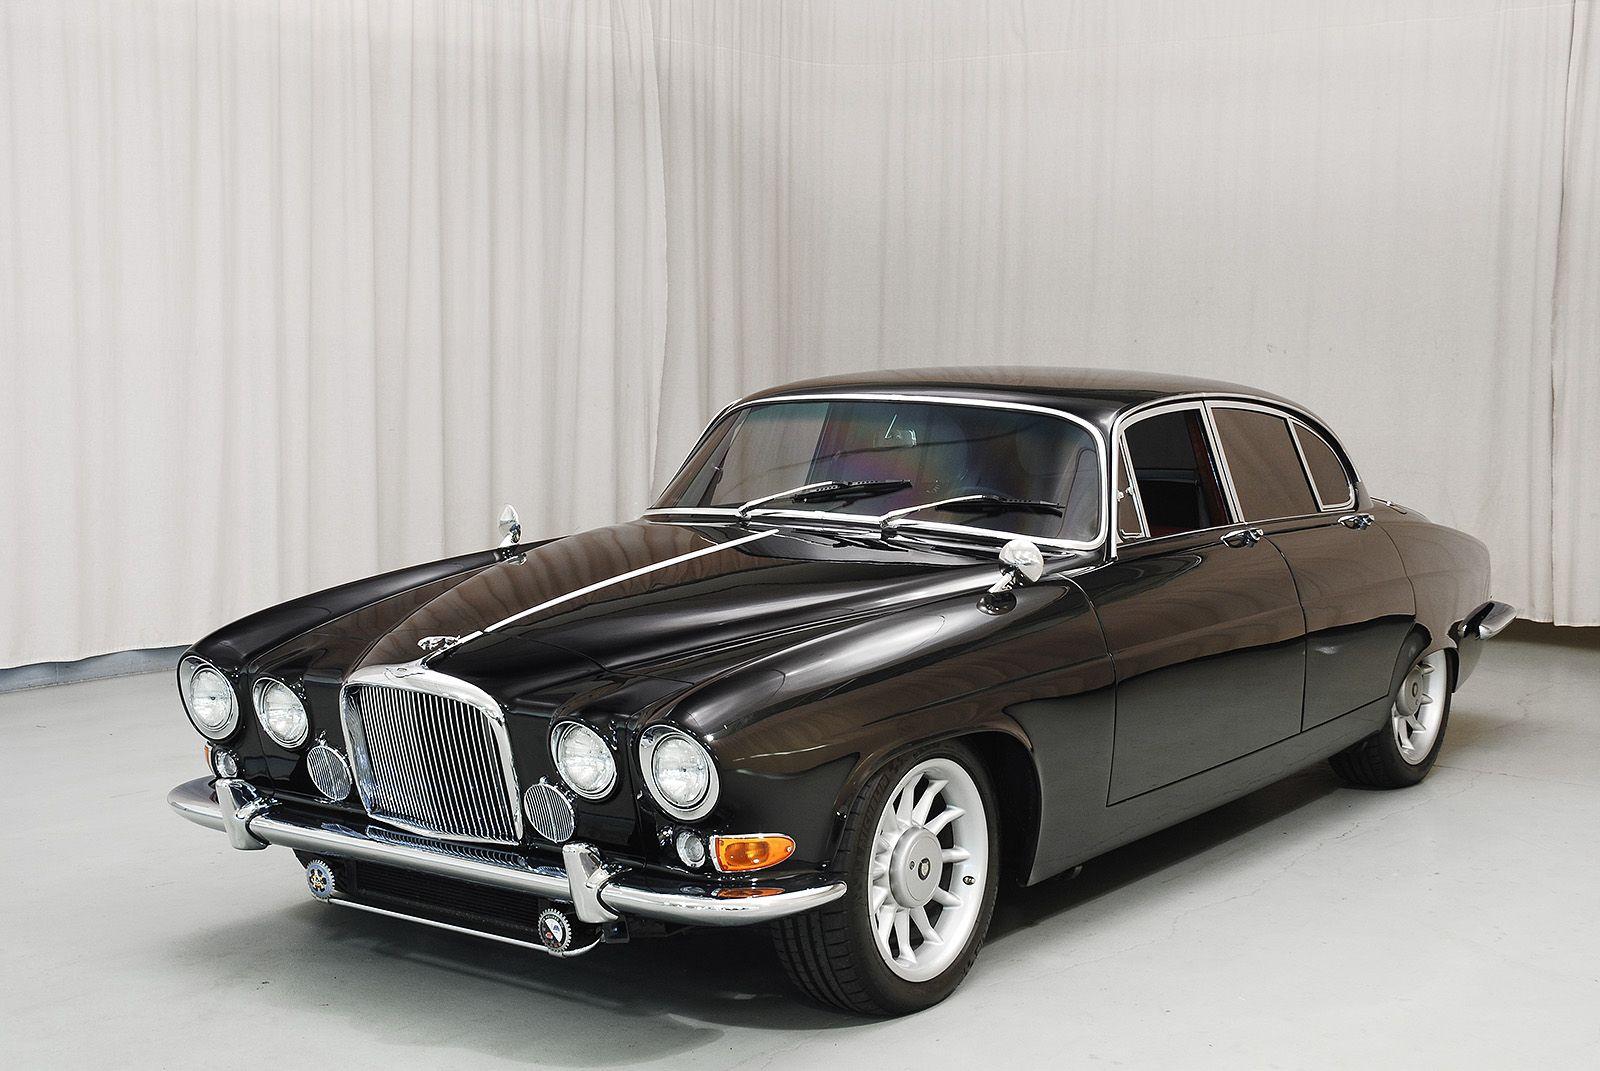 1966 Jaguar Mark X Still Costs 80 000 In 2015 Jaguar Car Classic Cars Best Classic Cars